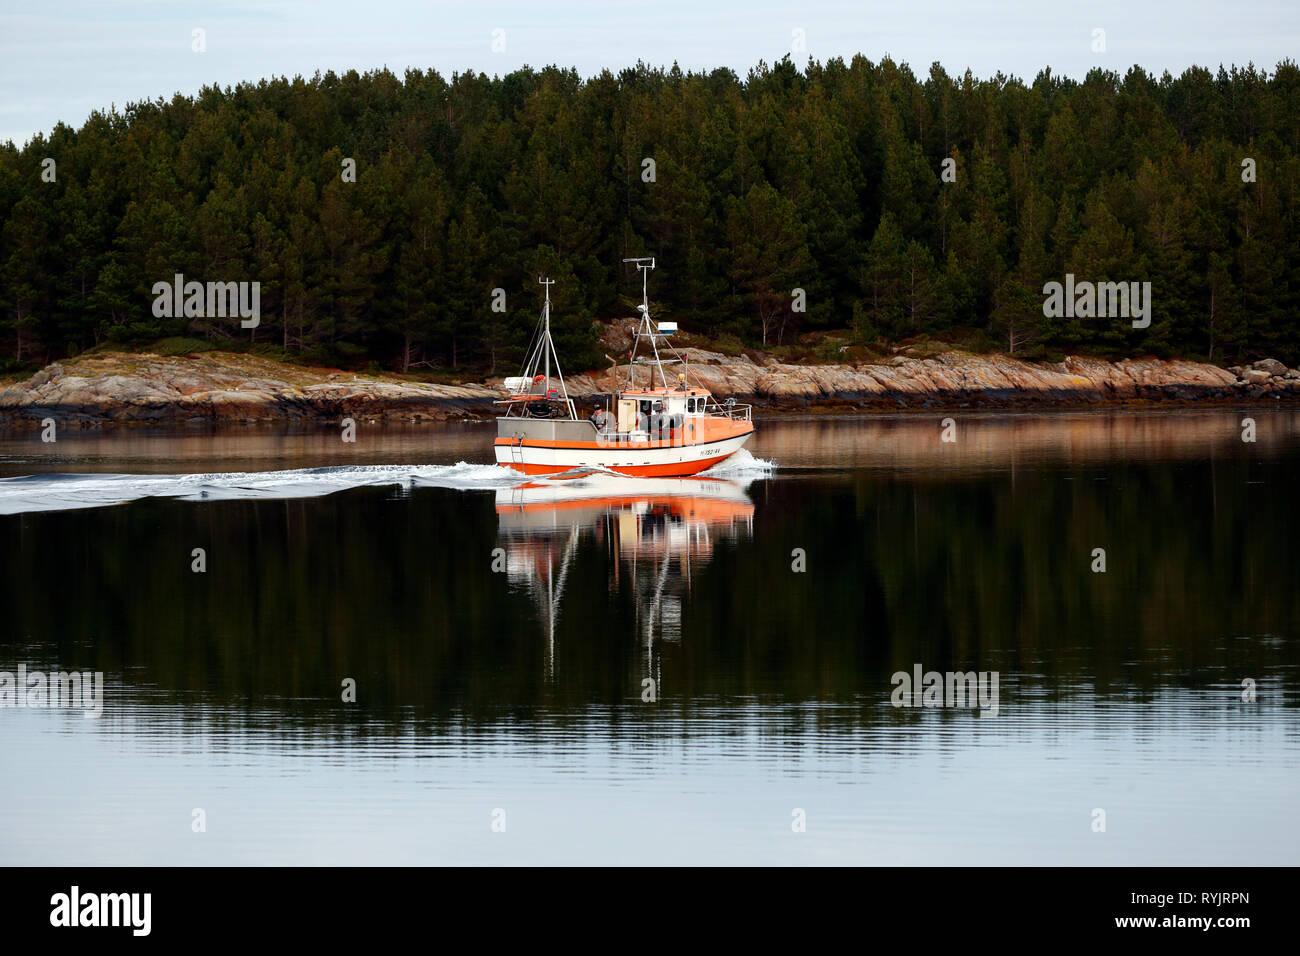 La pesca de arrastre. Noruega. Foto de stock